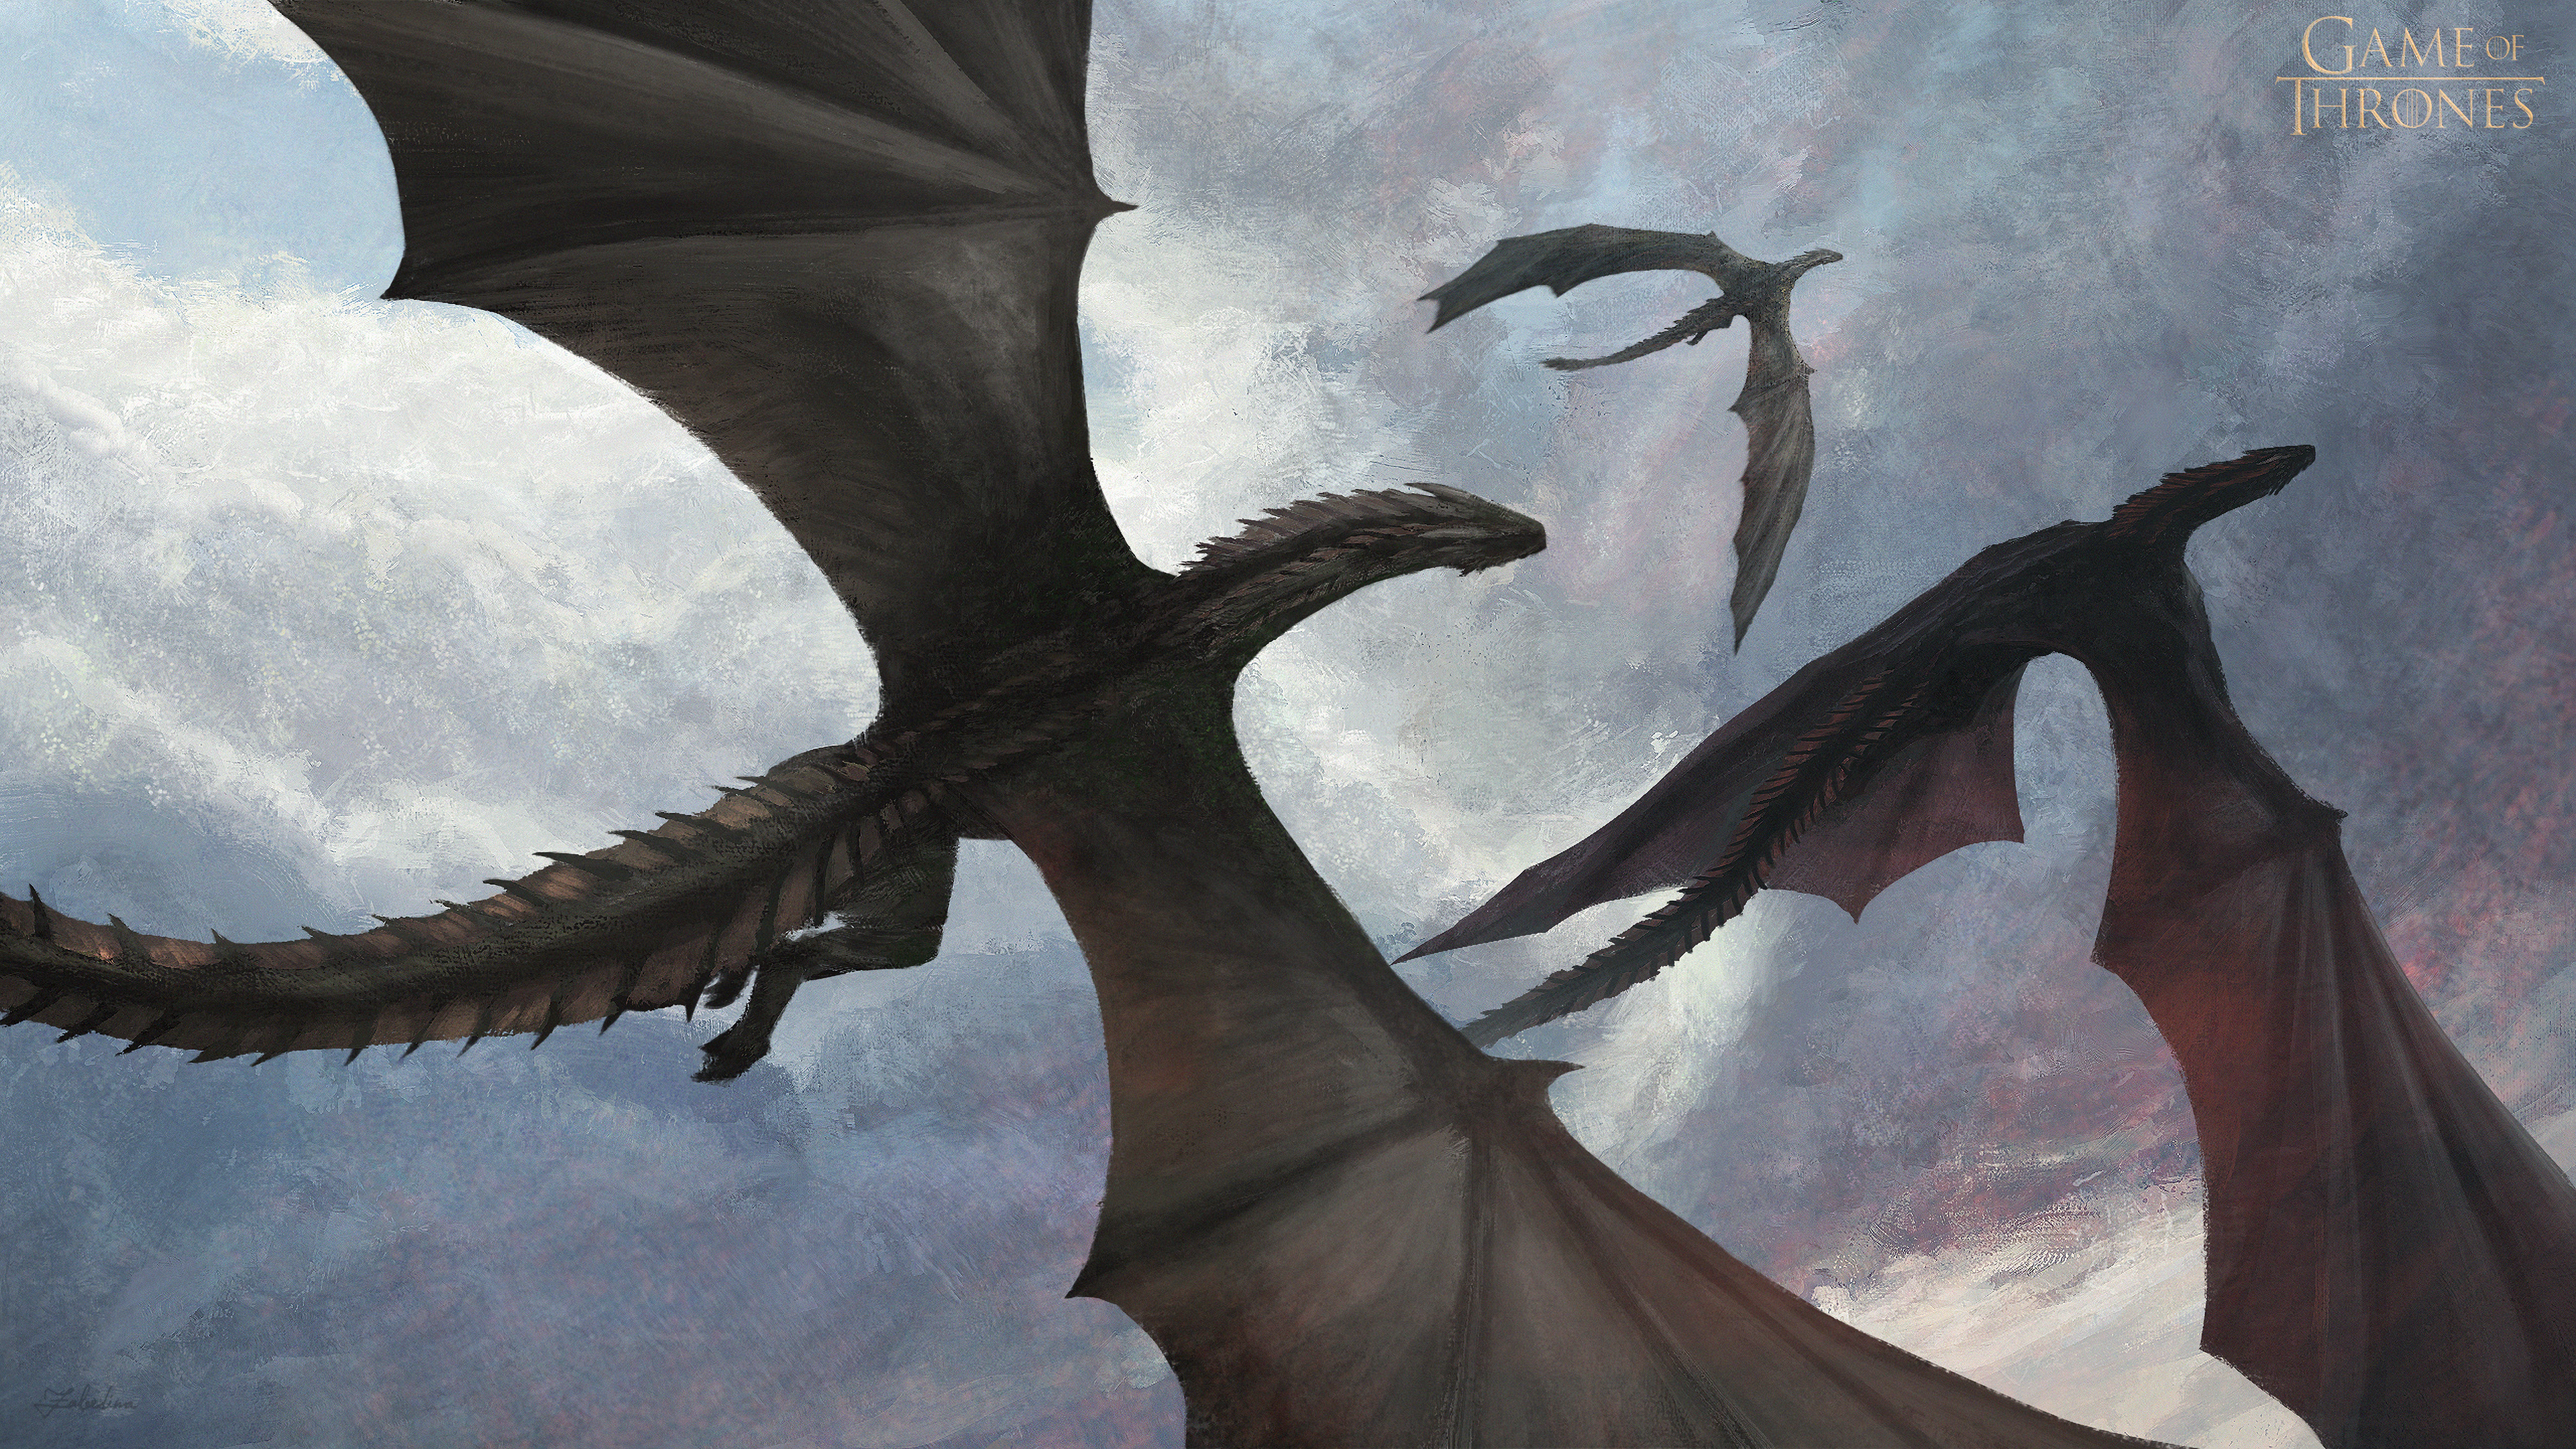 valar morghulis 1578251926 - Valar Morghulis - Valar Morghulis 4k wallpaper